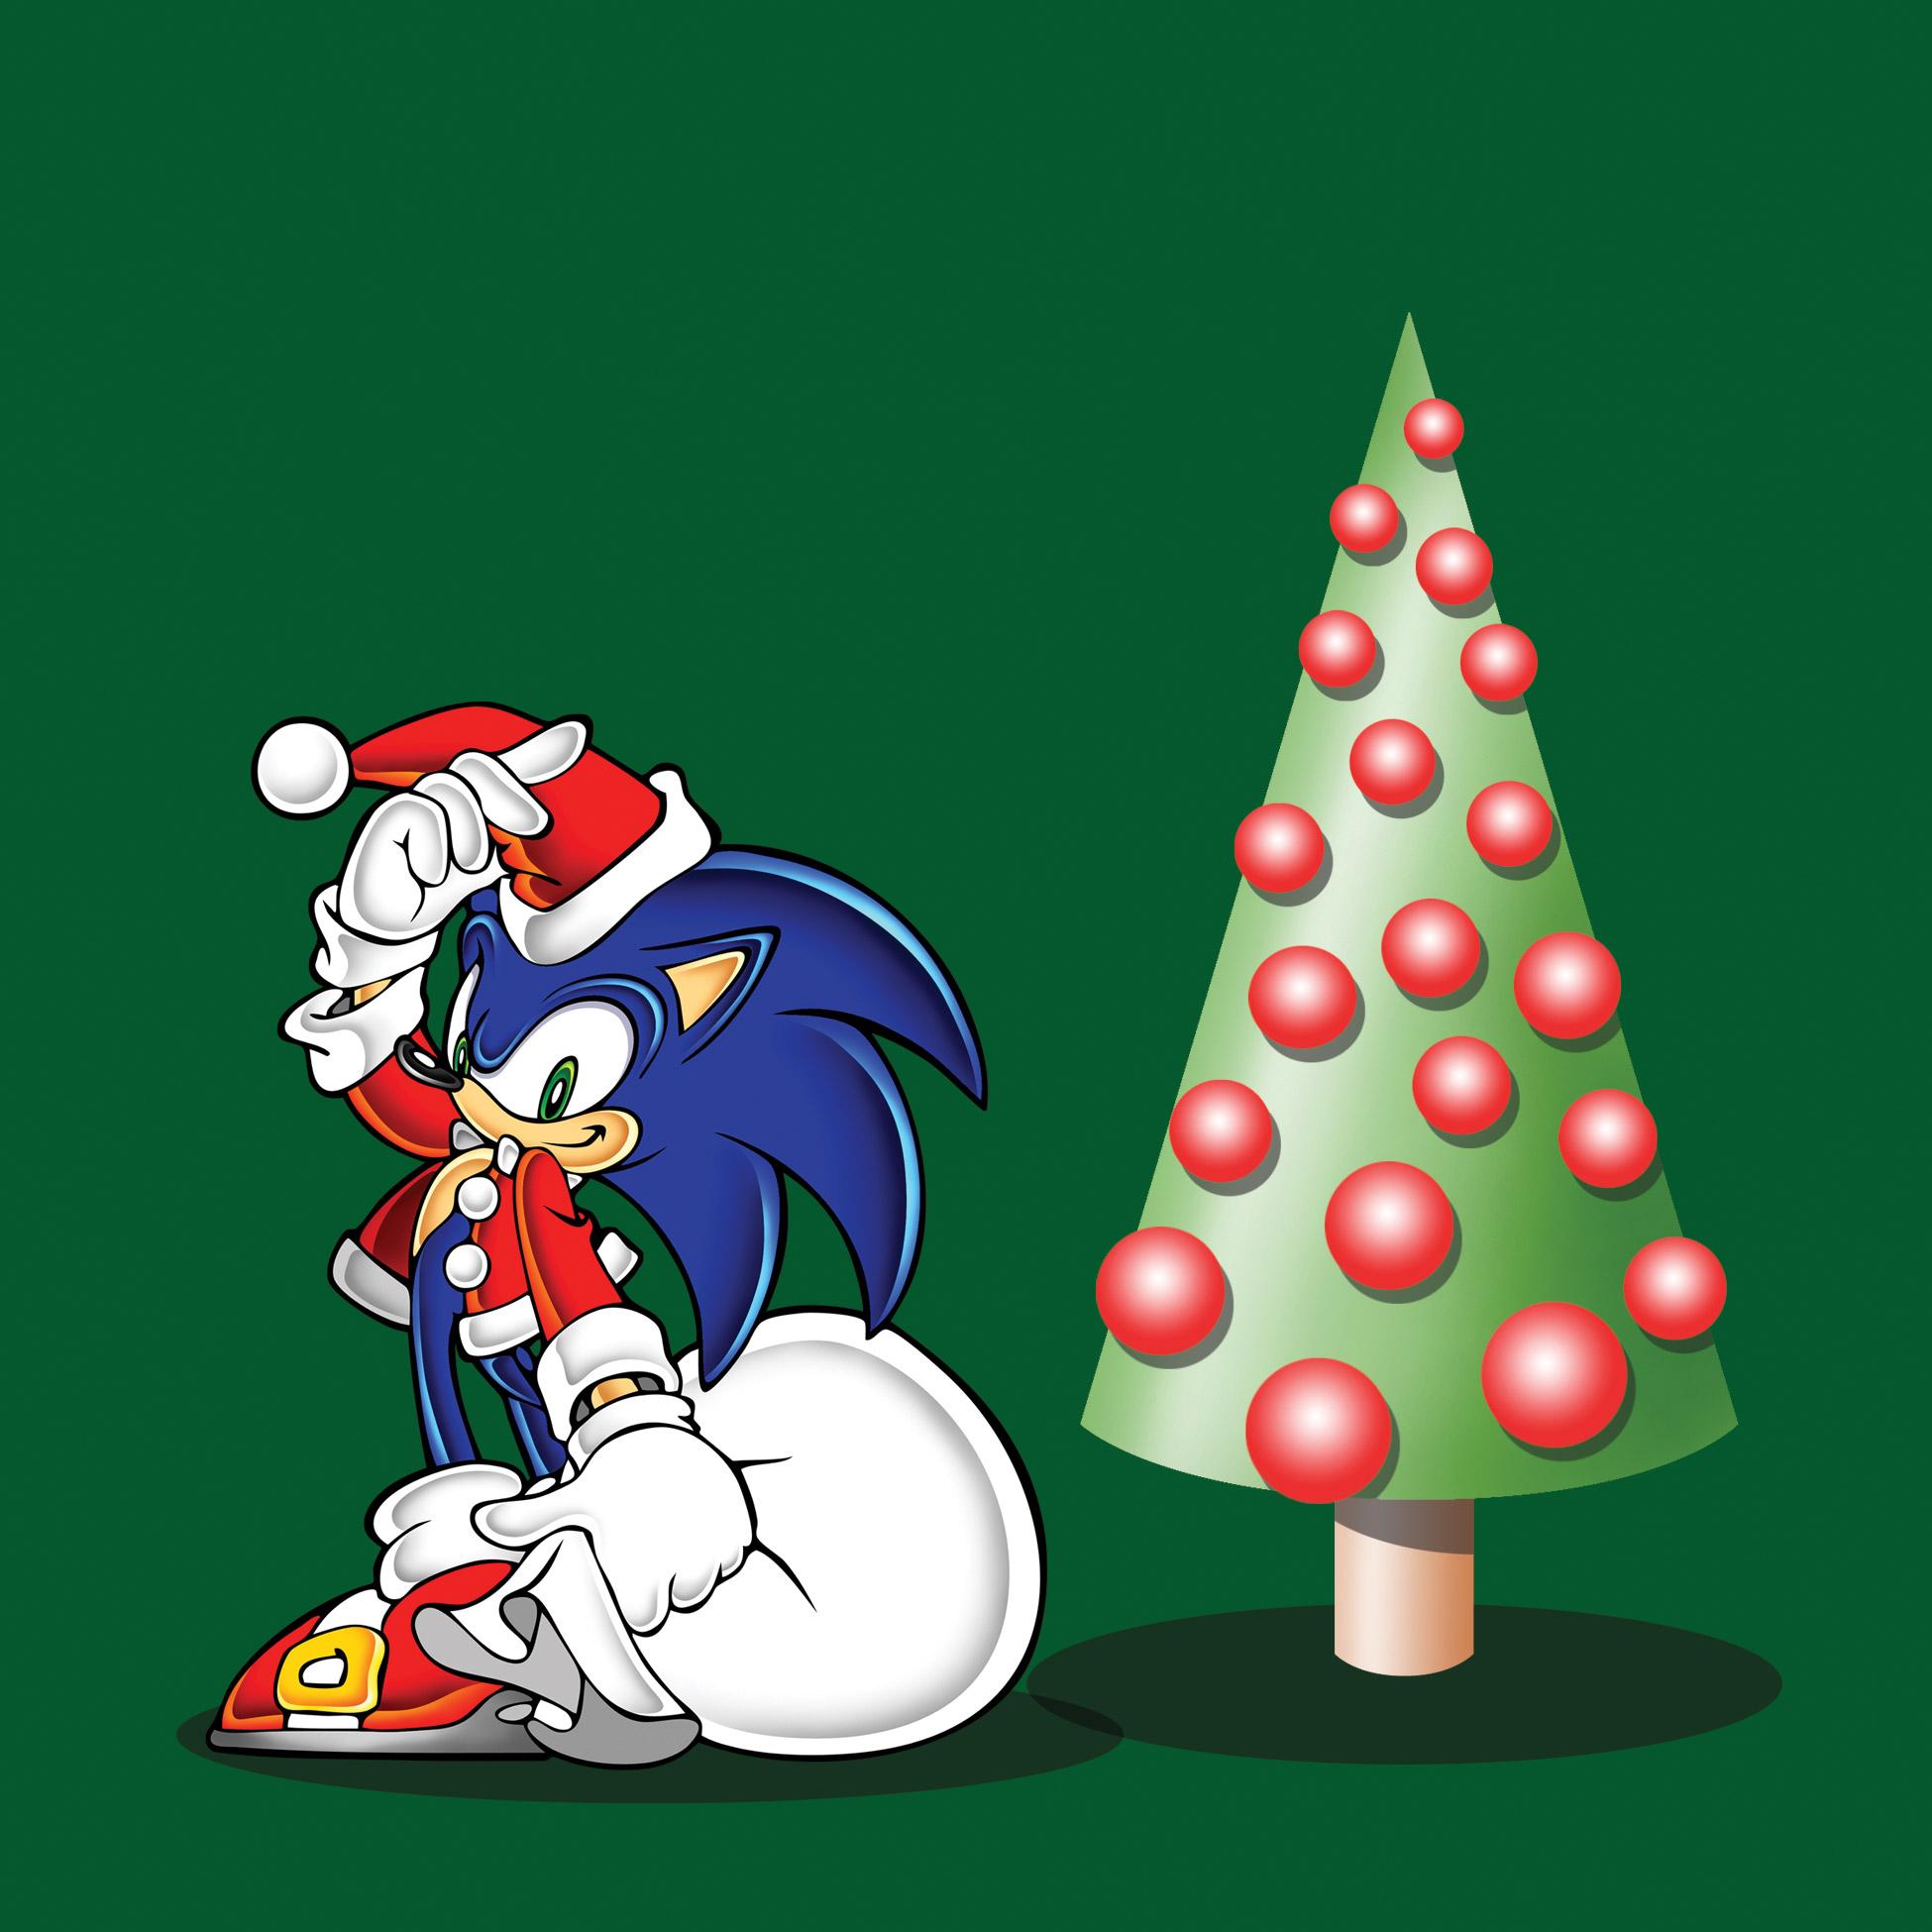 sonic the hedgehog adventure era sega christmas card design - Sonic Hours Christmas Day